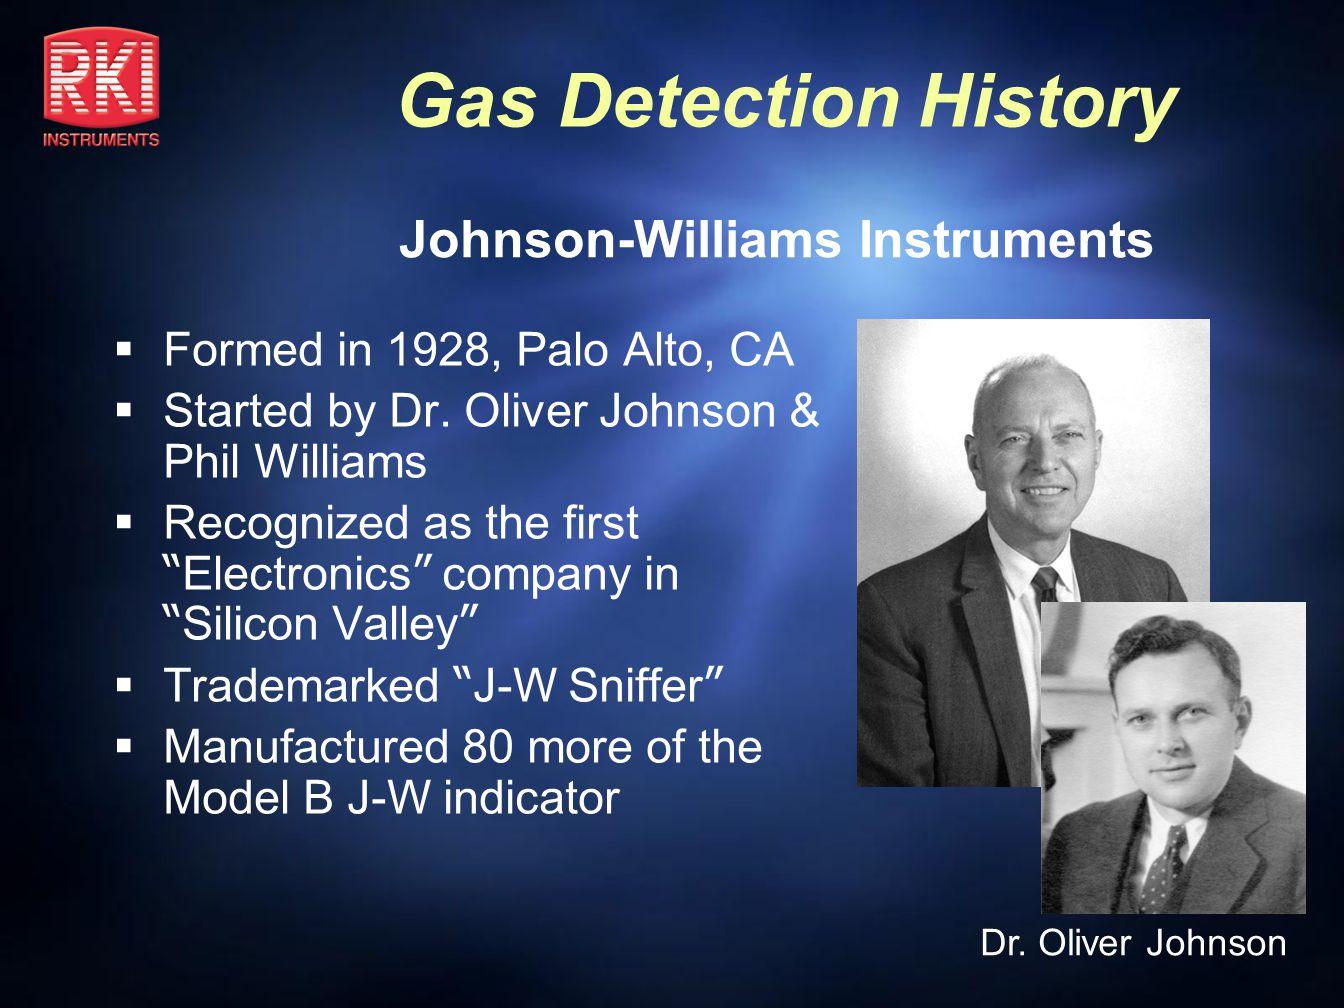 Johnson-Williams Instruments